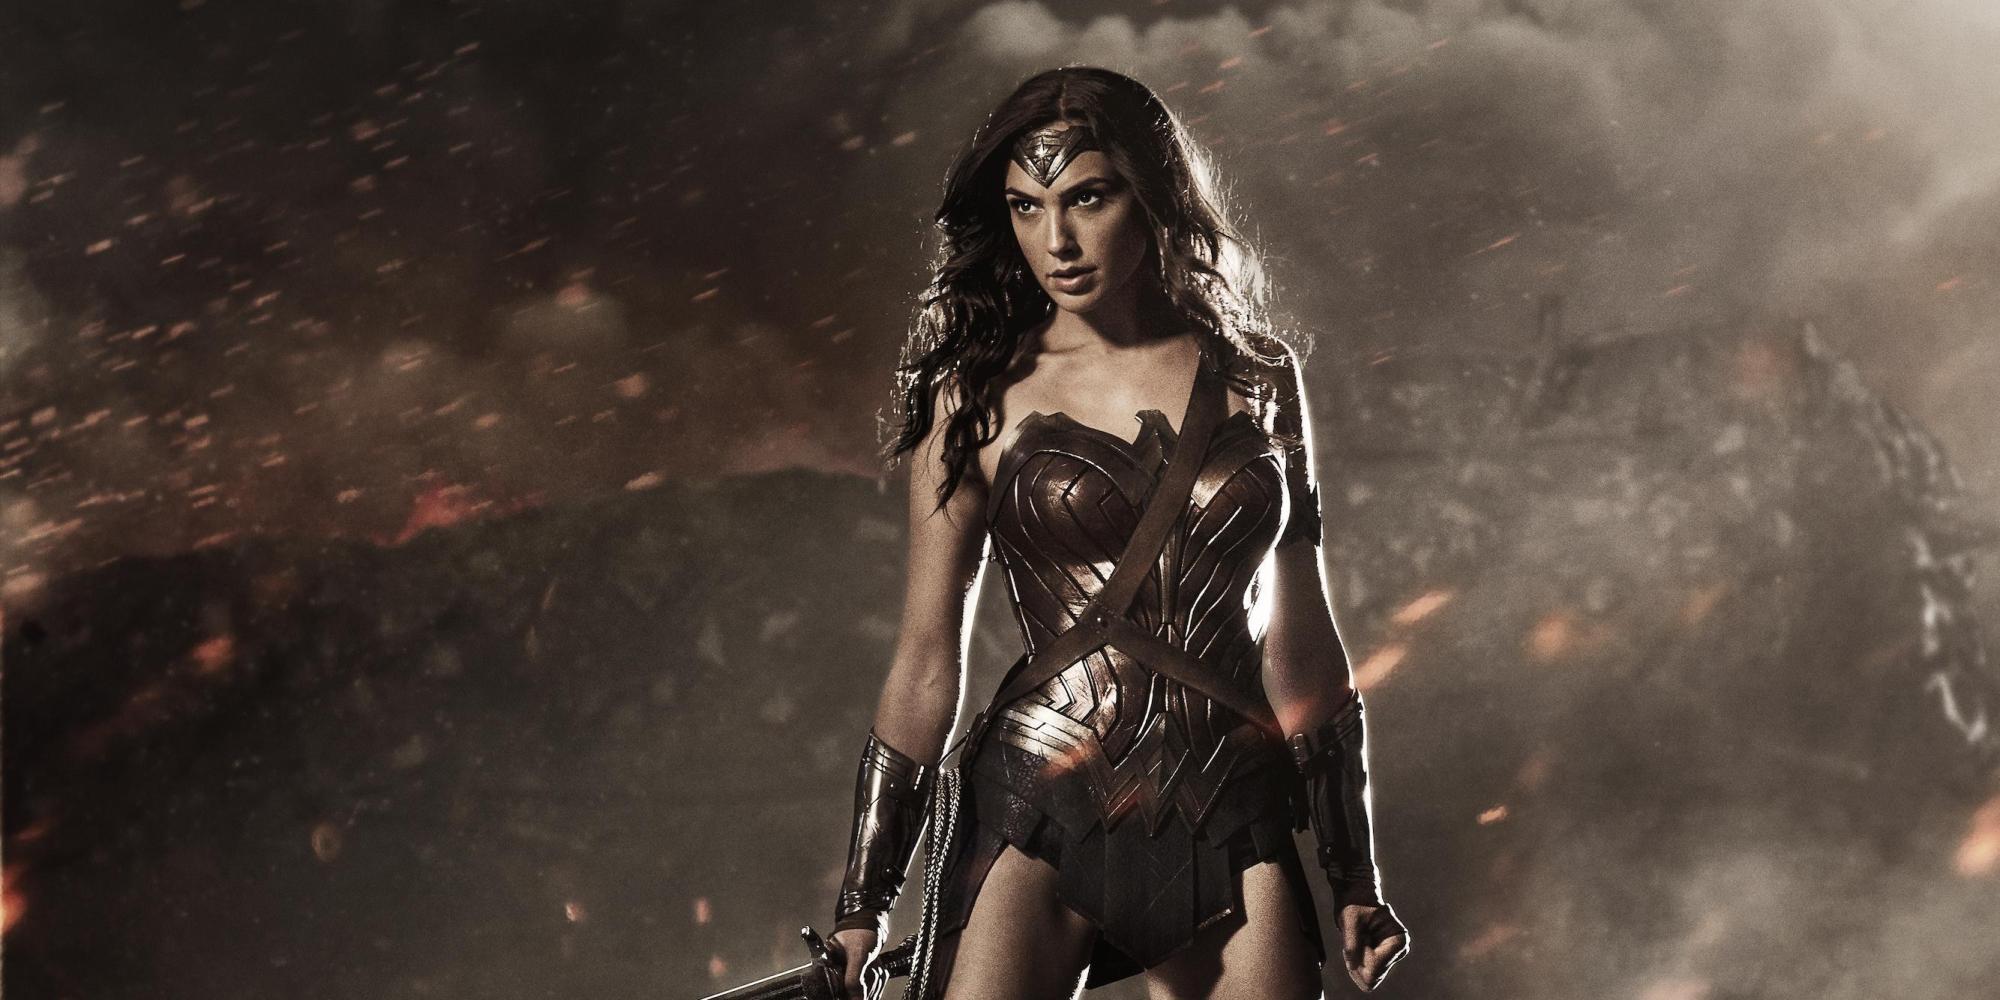 'Wonder Woman' to Begin Filming This Year